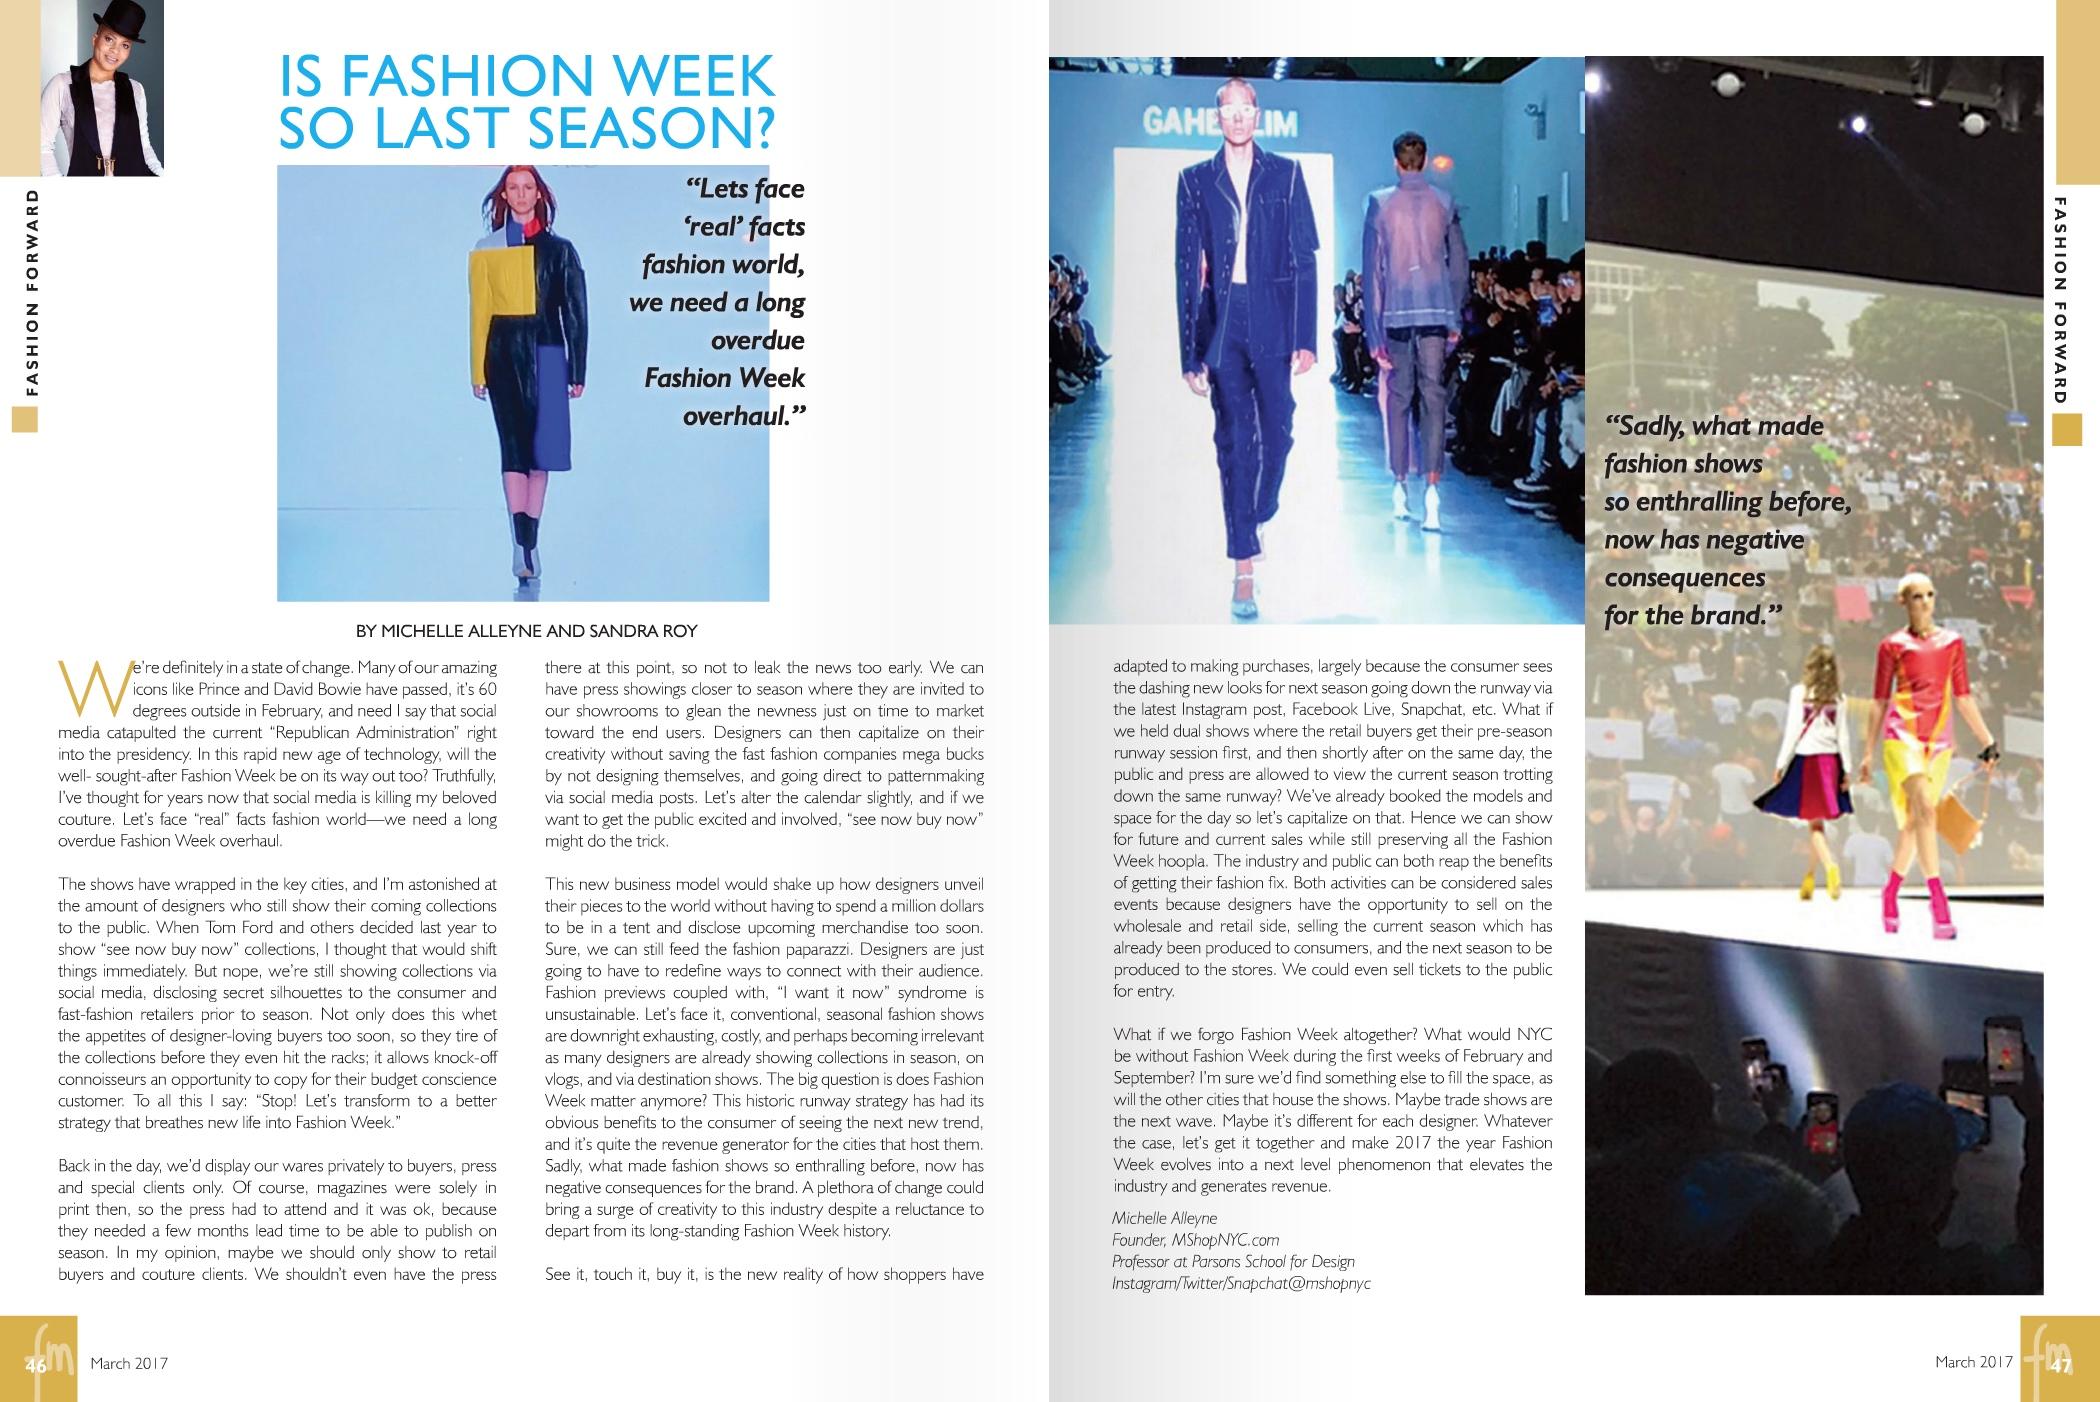 Fashion Mannuscript March 2017 by Michelle Alleyne and Sandra Roy